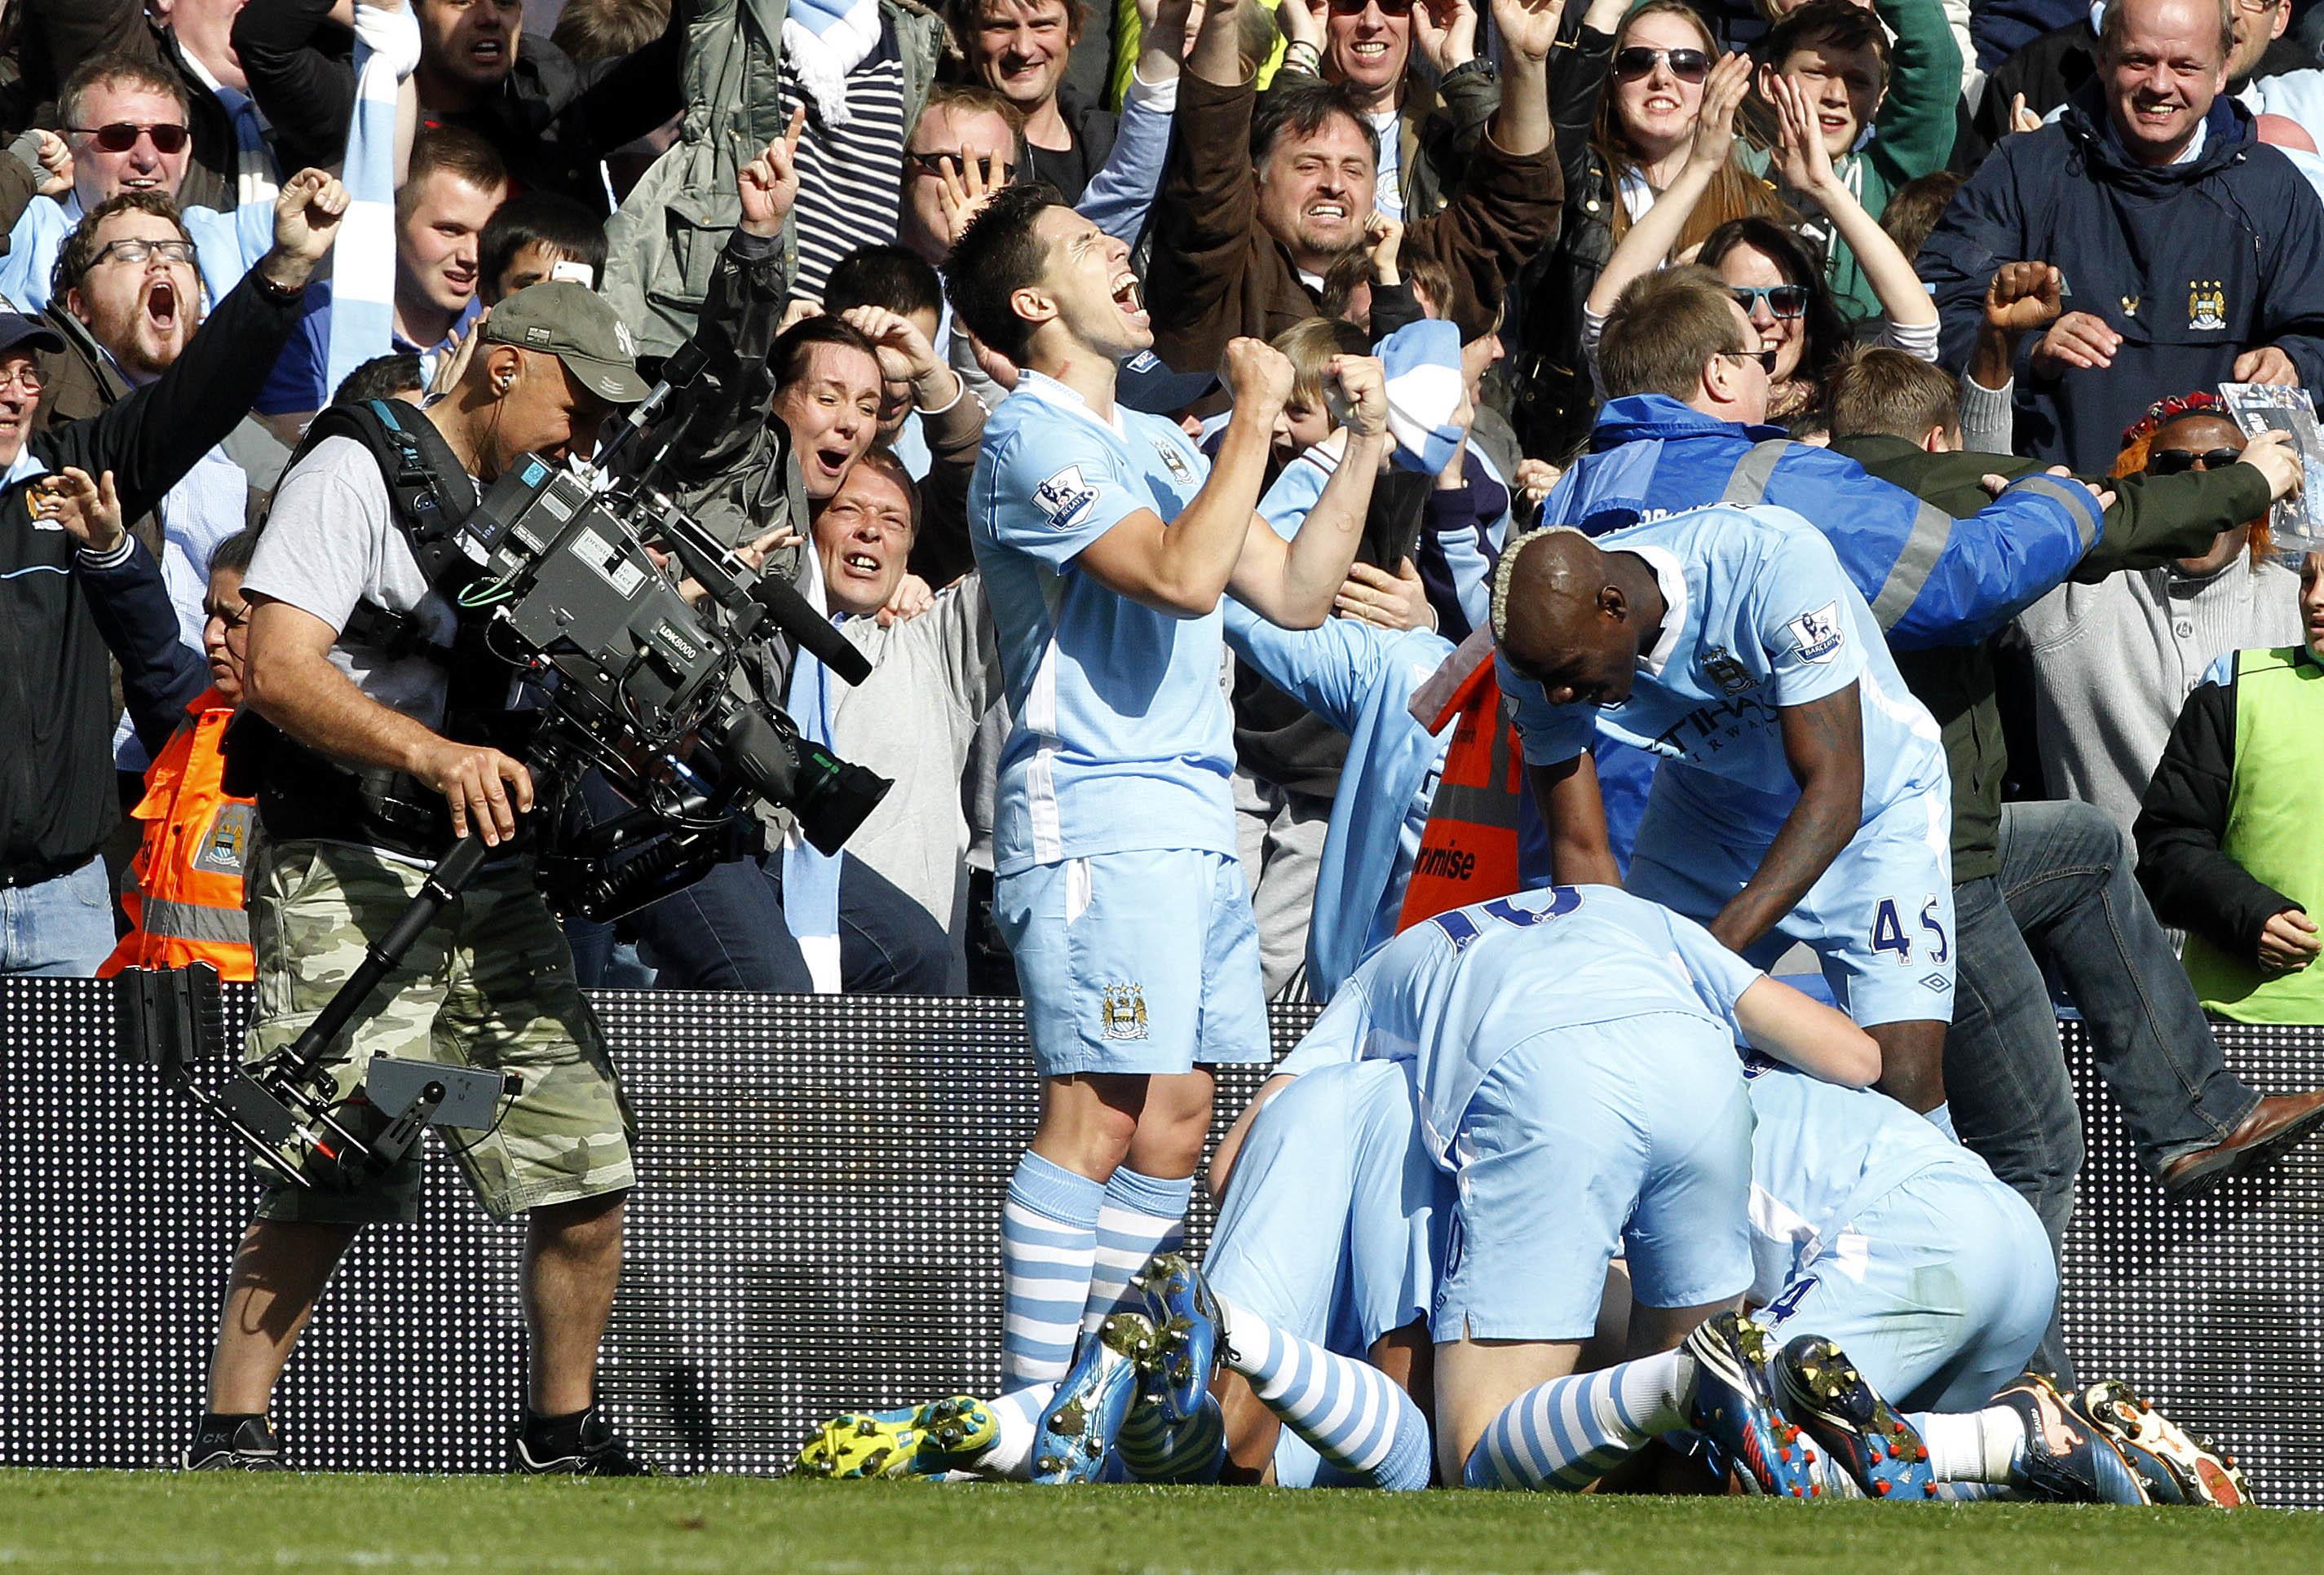 Scenes after Aguero's last minute goal. Image: PA Images